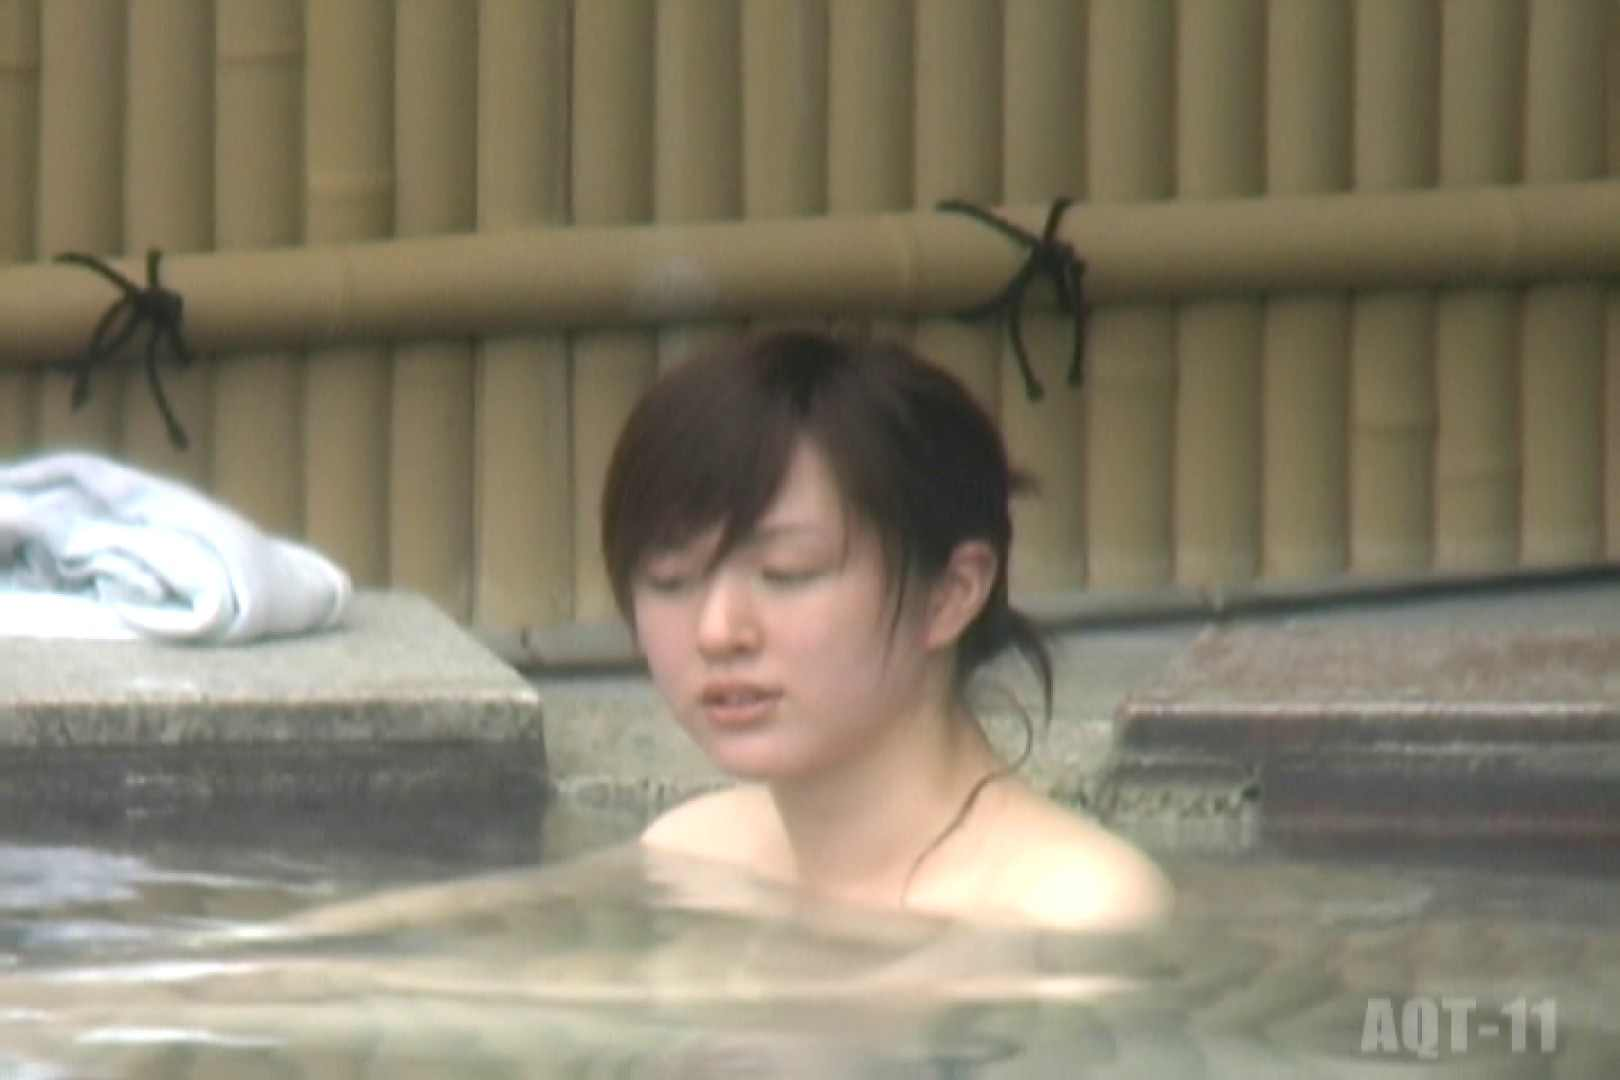 Aquaな露天風呂Vol.798 0 | 0  17連発 16